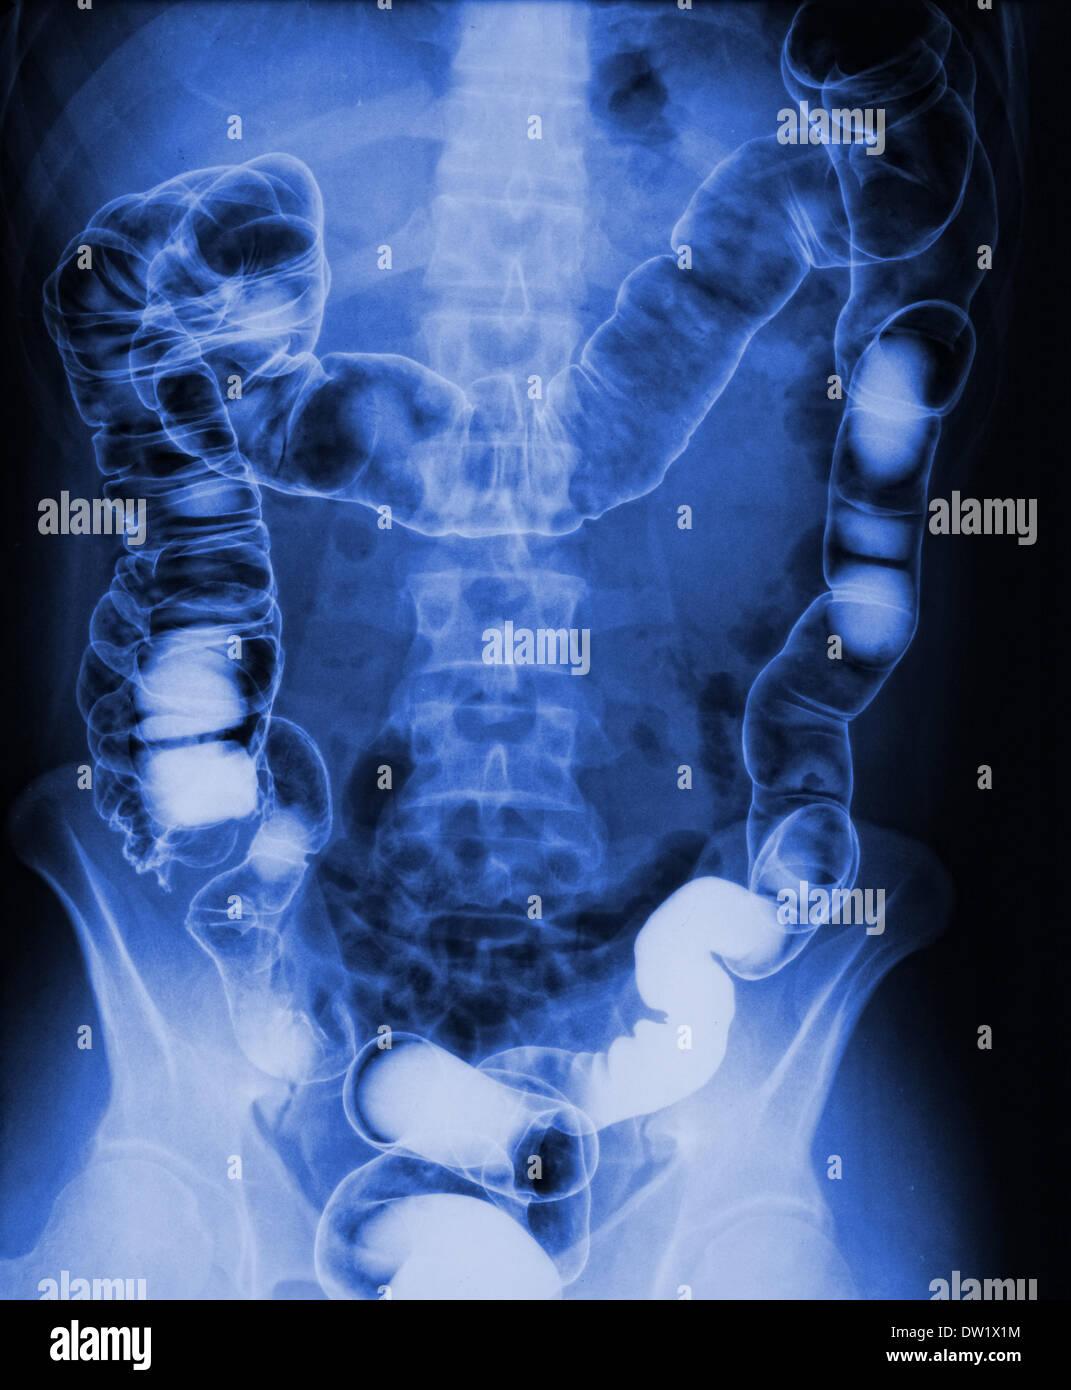 torso xray - Stock Image